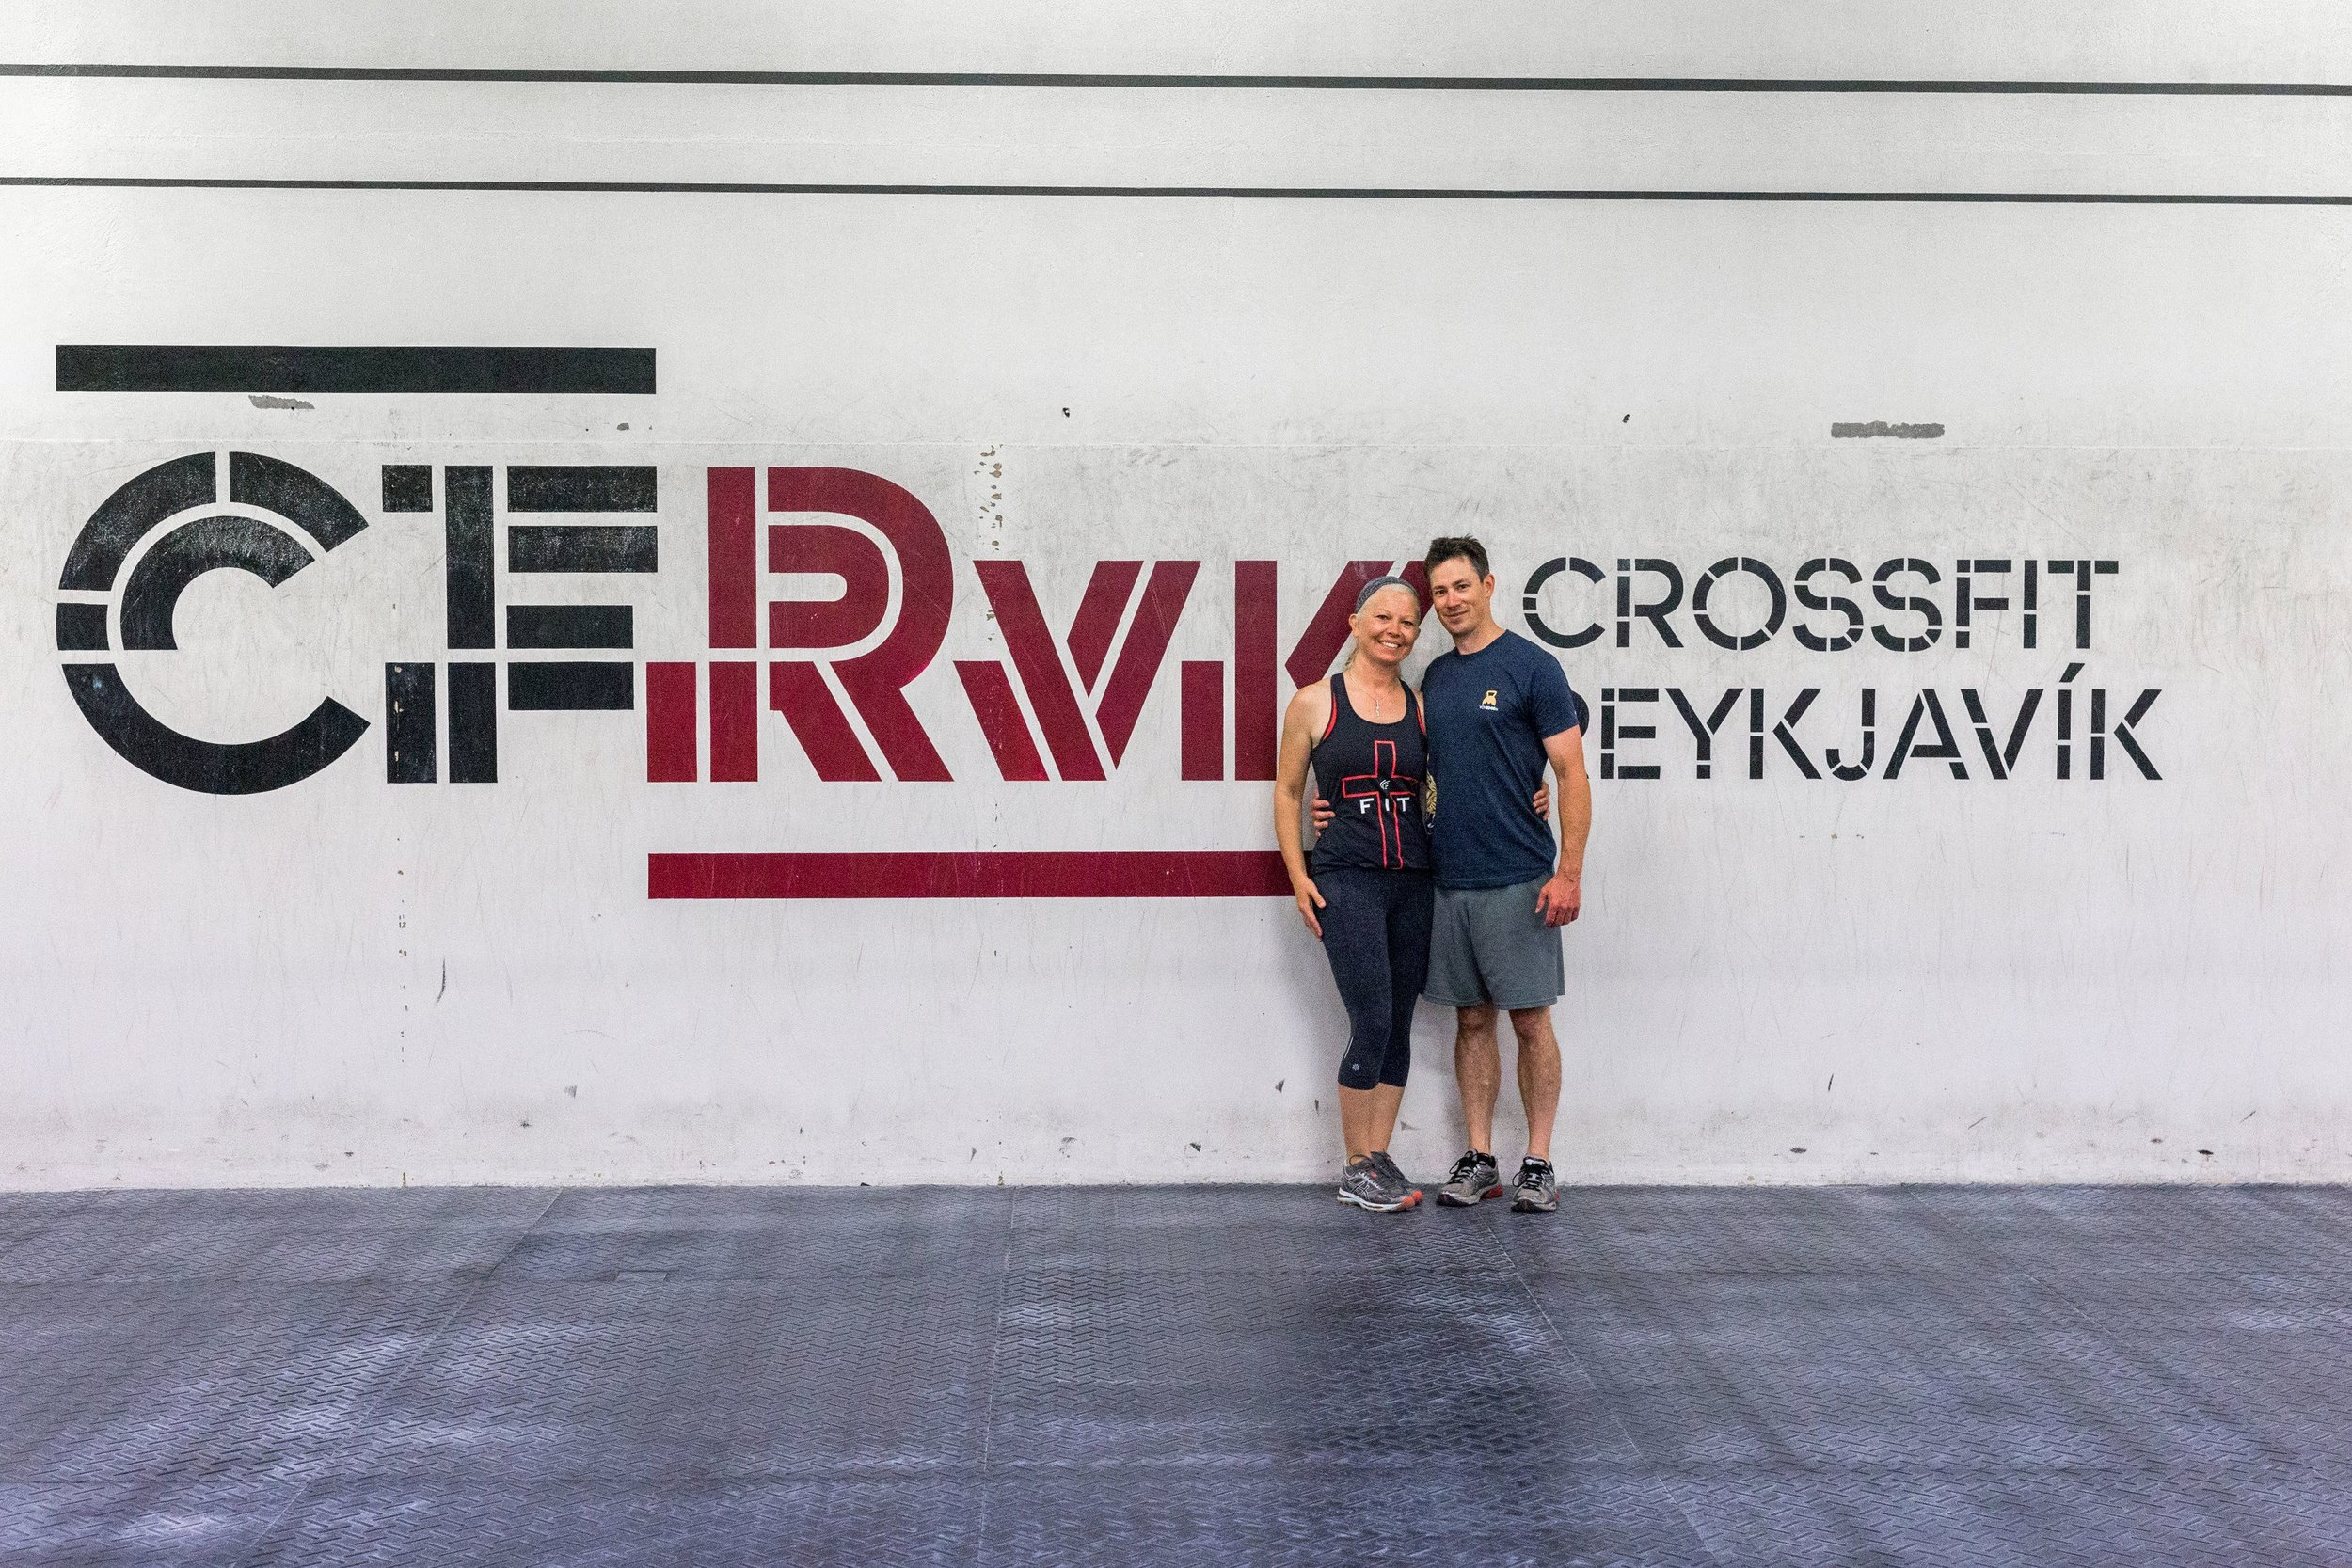 voyedge rx fitness travel tour iceland